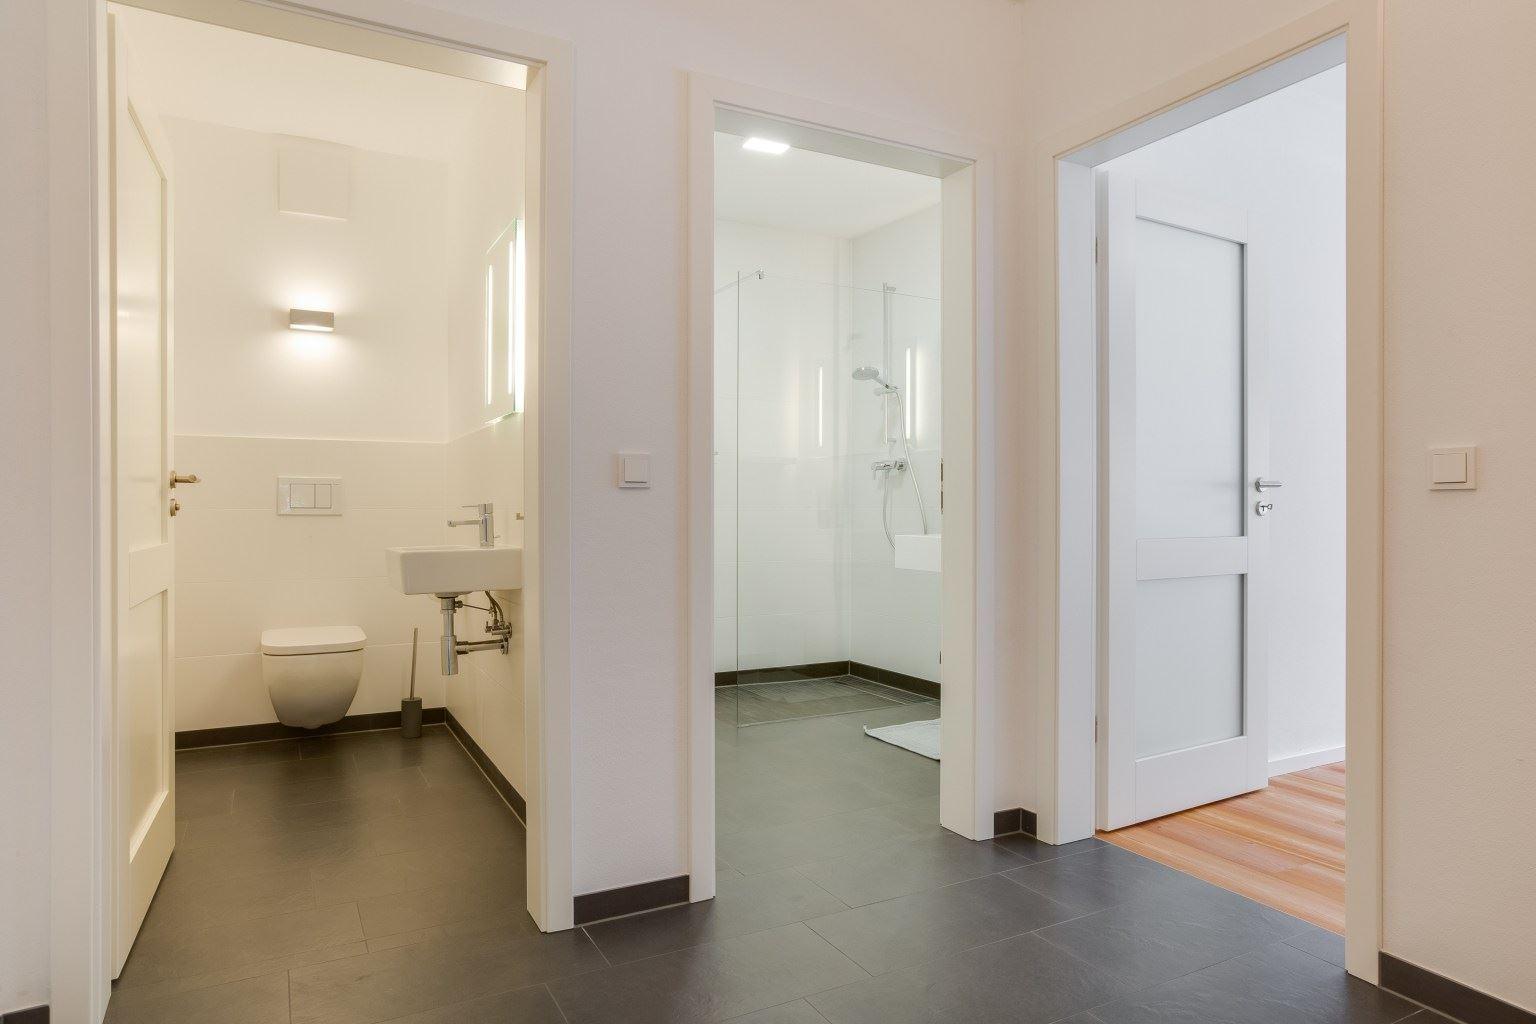 "Flur mit Bad und WC - St Peter Ording Umgebung, The Old Barn, Suite ""Lena"", Koogstraße 9, Tümlauer Koog"